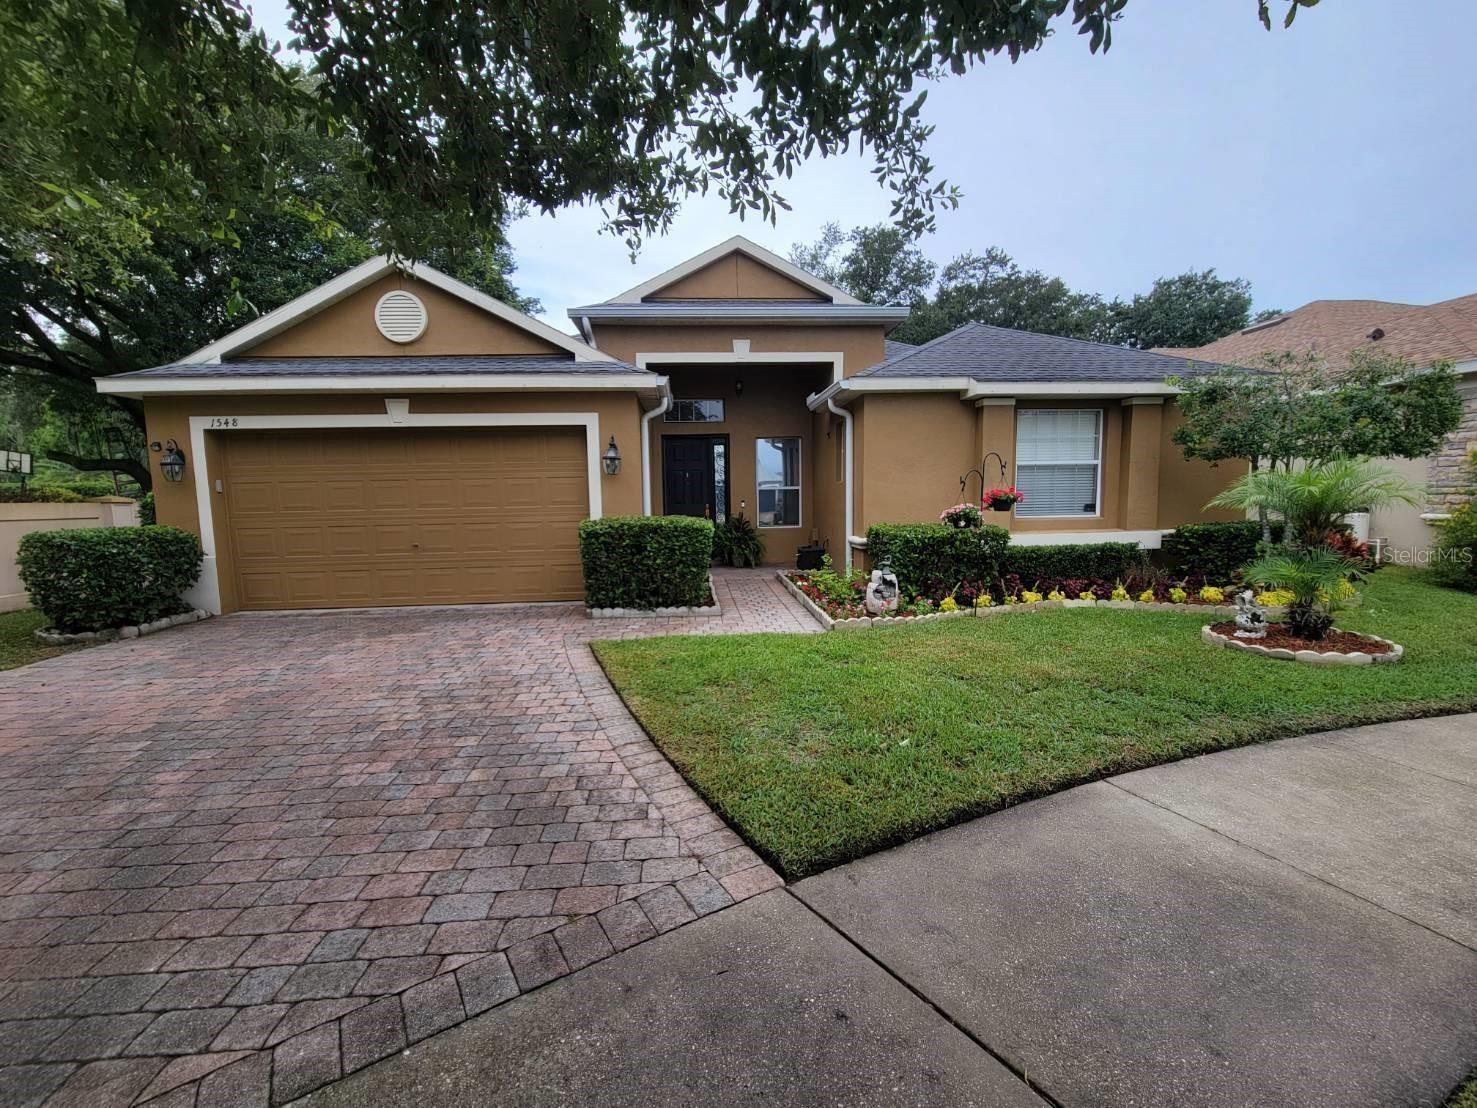 1548 SAINT REGIS POINT, Sanford, FL 32771 - #: O5955672